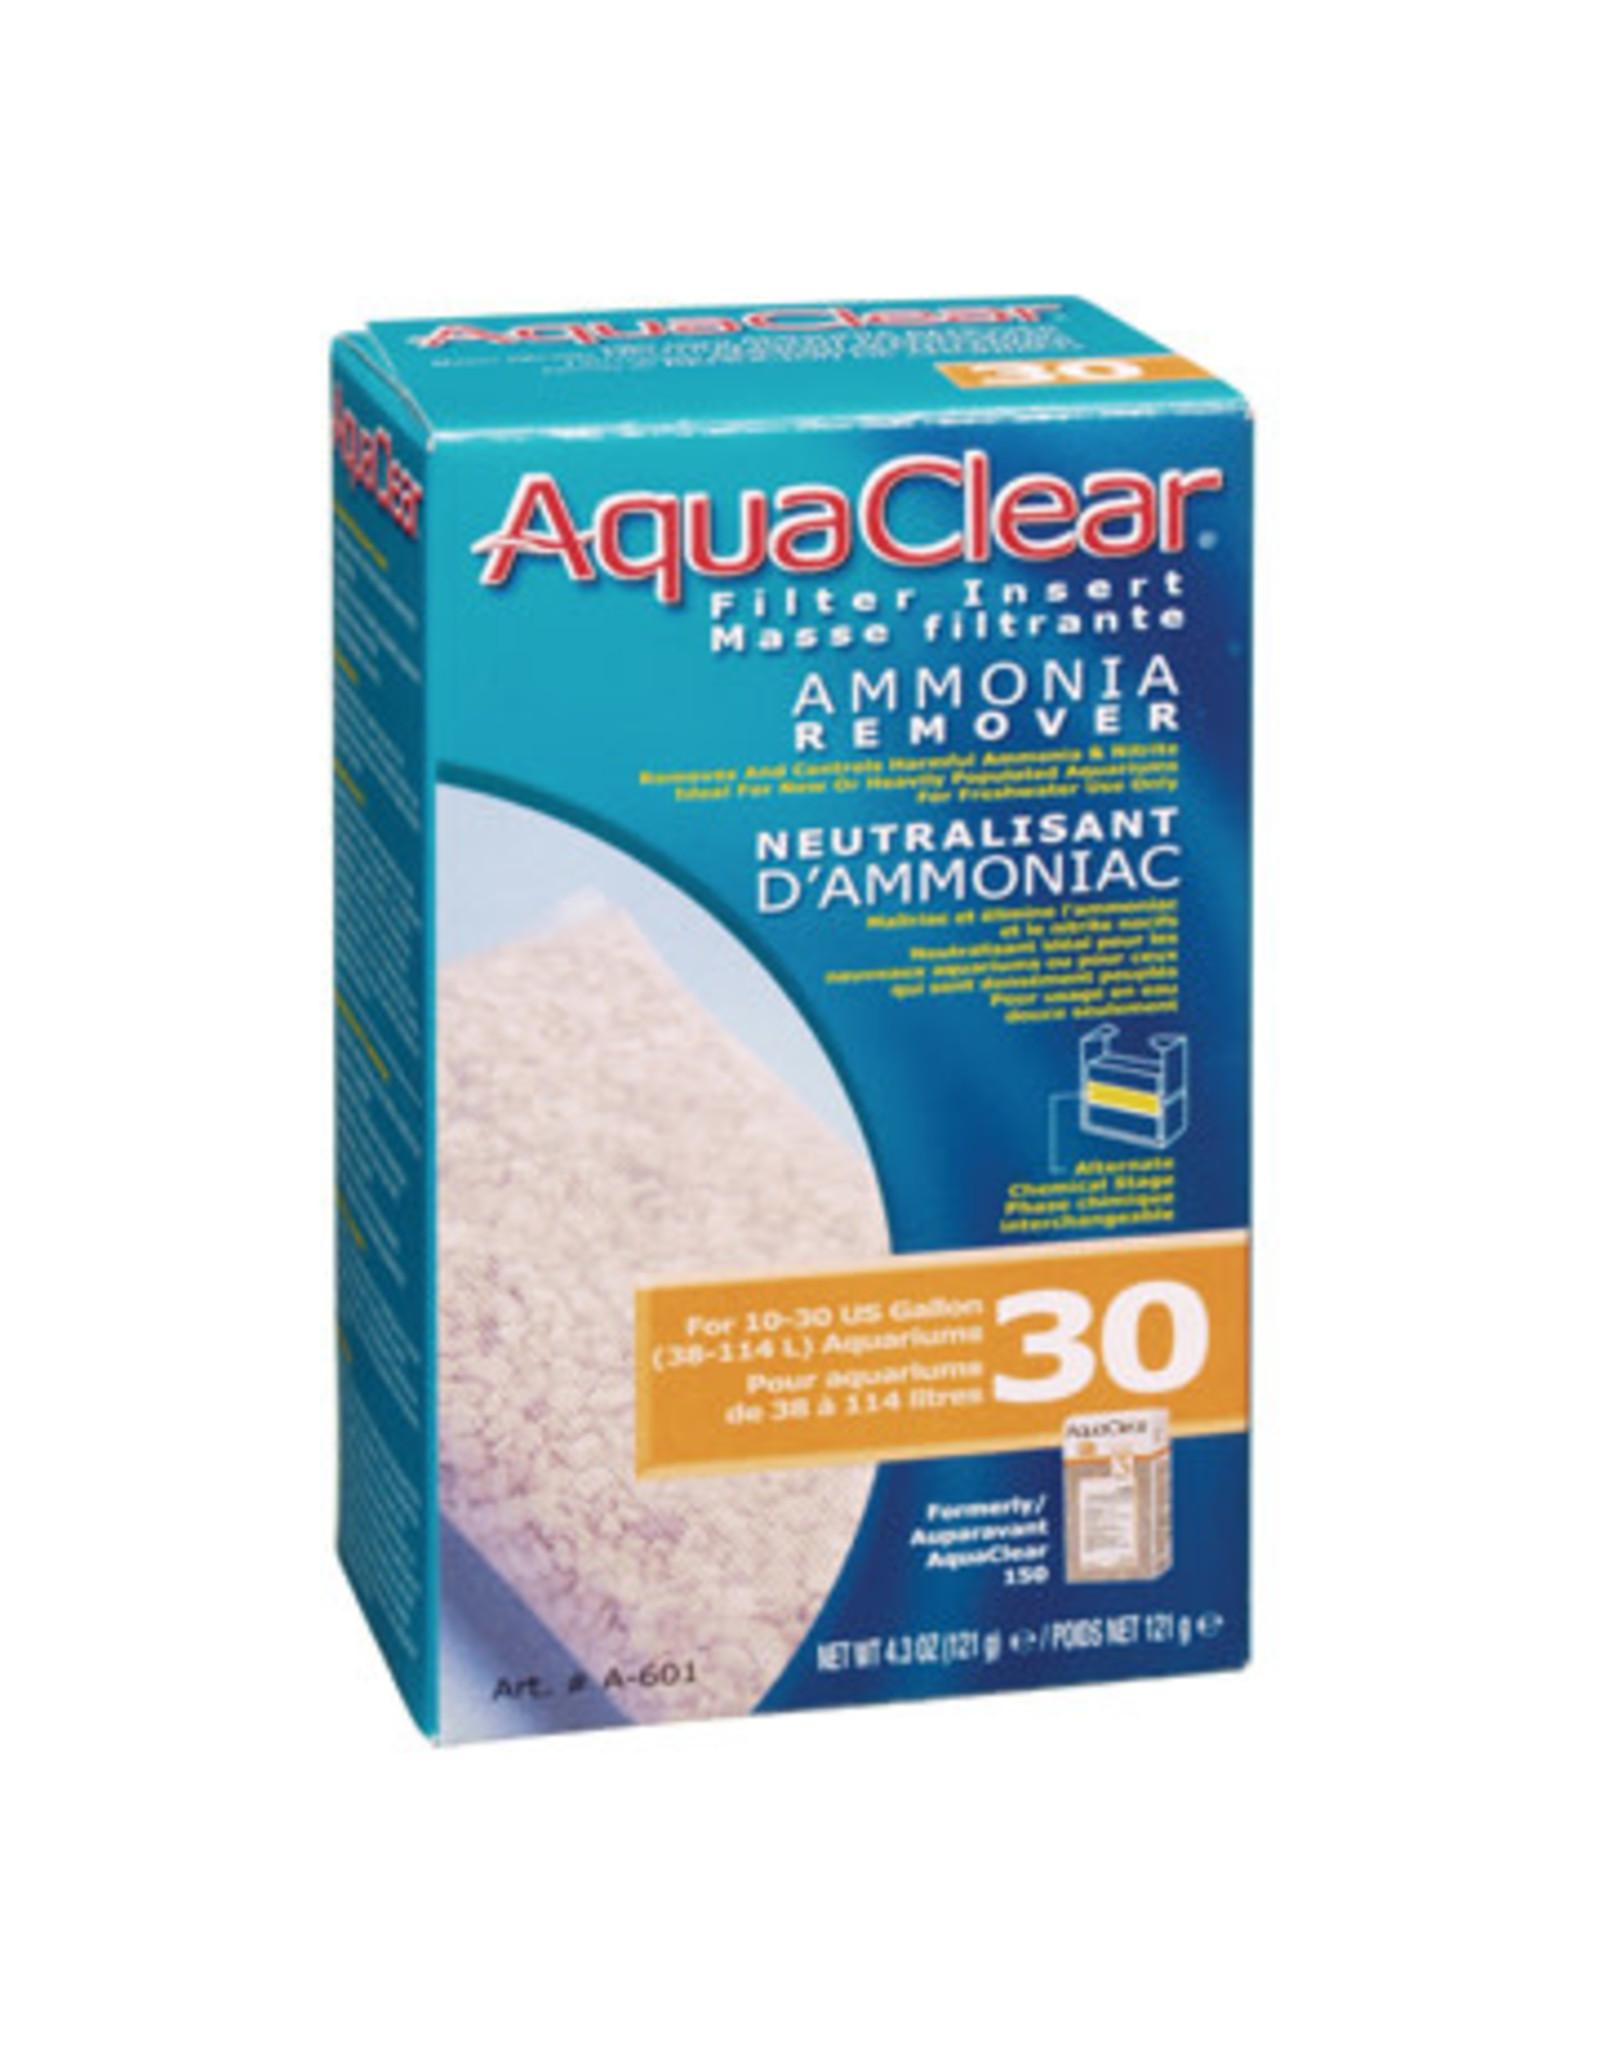 AquaClear AquaClear 30 Ammonia Remover Filter Insert 121g